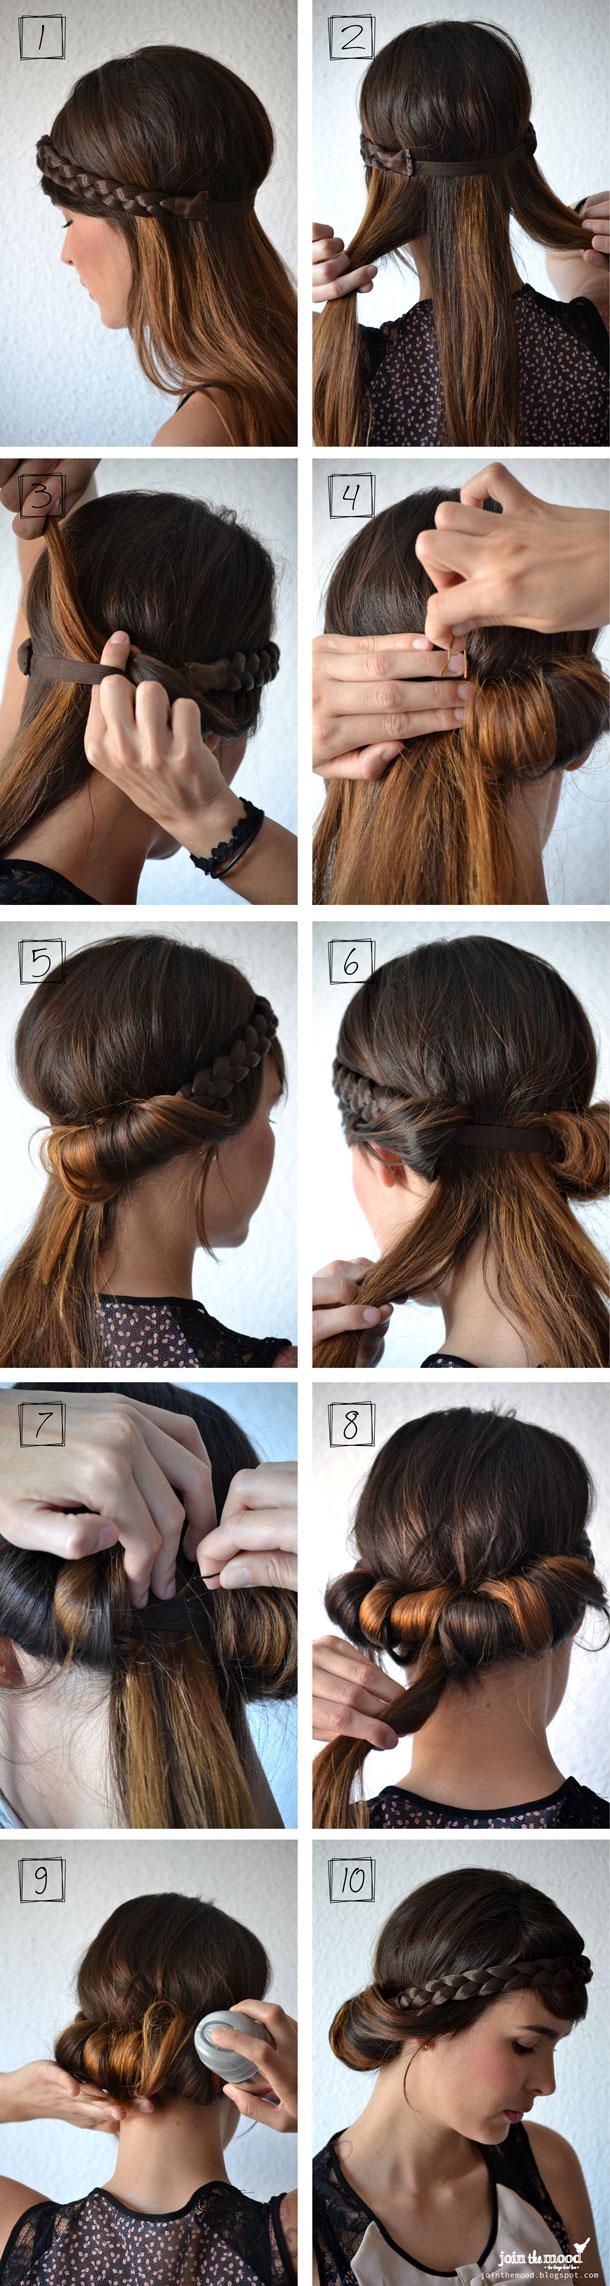 headband braid tutorial - photo #15